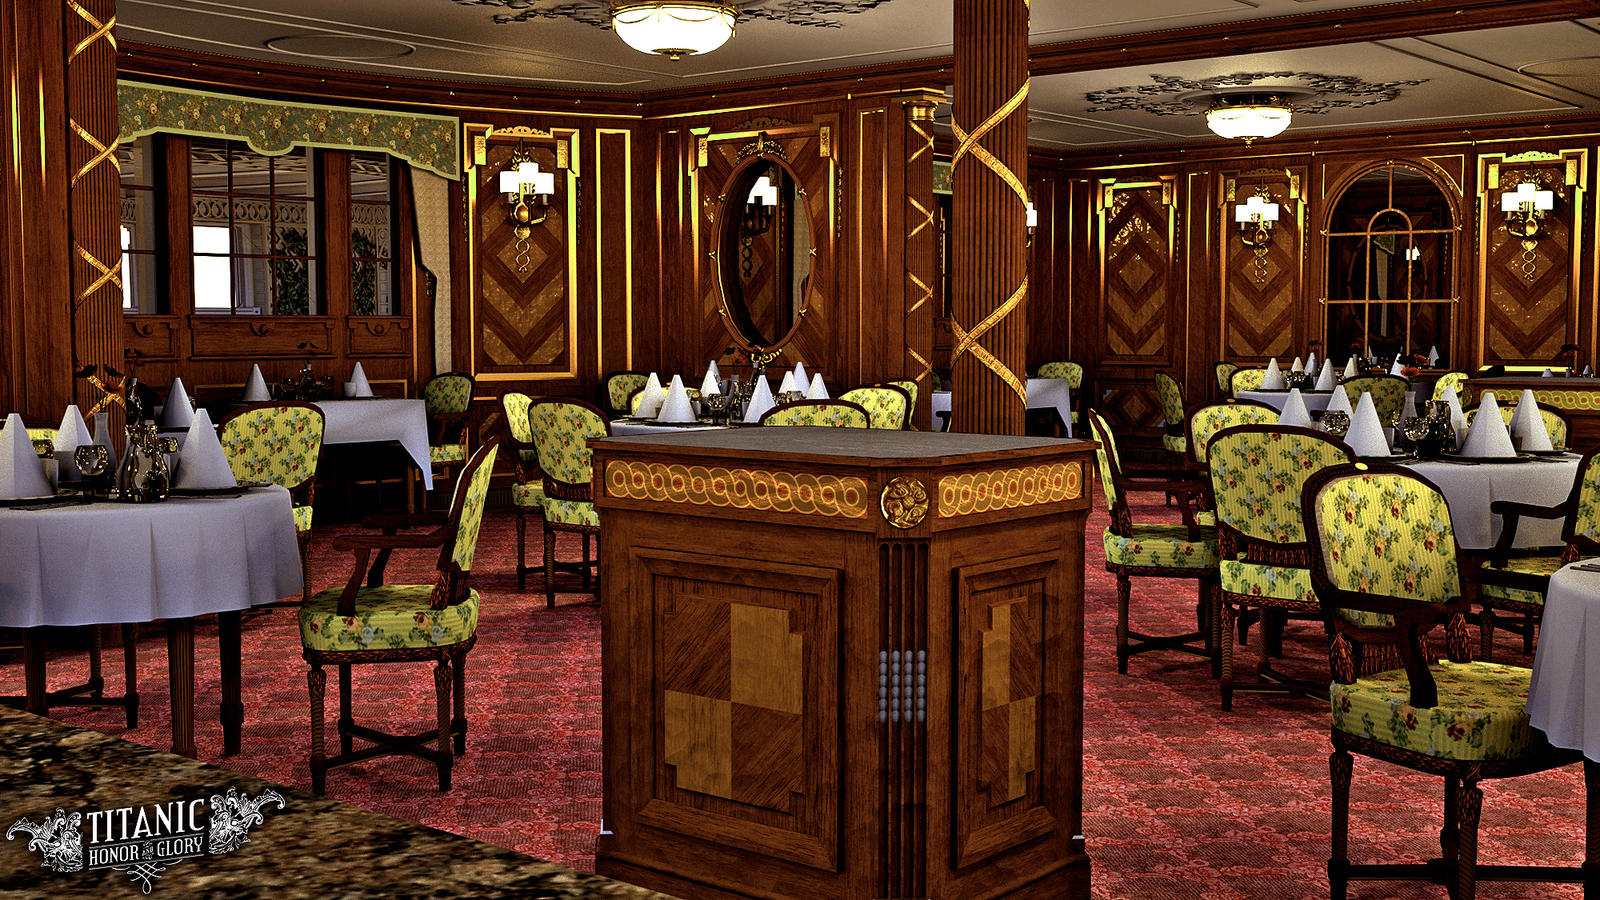 titanic s first class a la carte restaurant by titanichonorandglory titanic s first class a la carte restaurant by titanichonorandglory